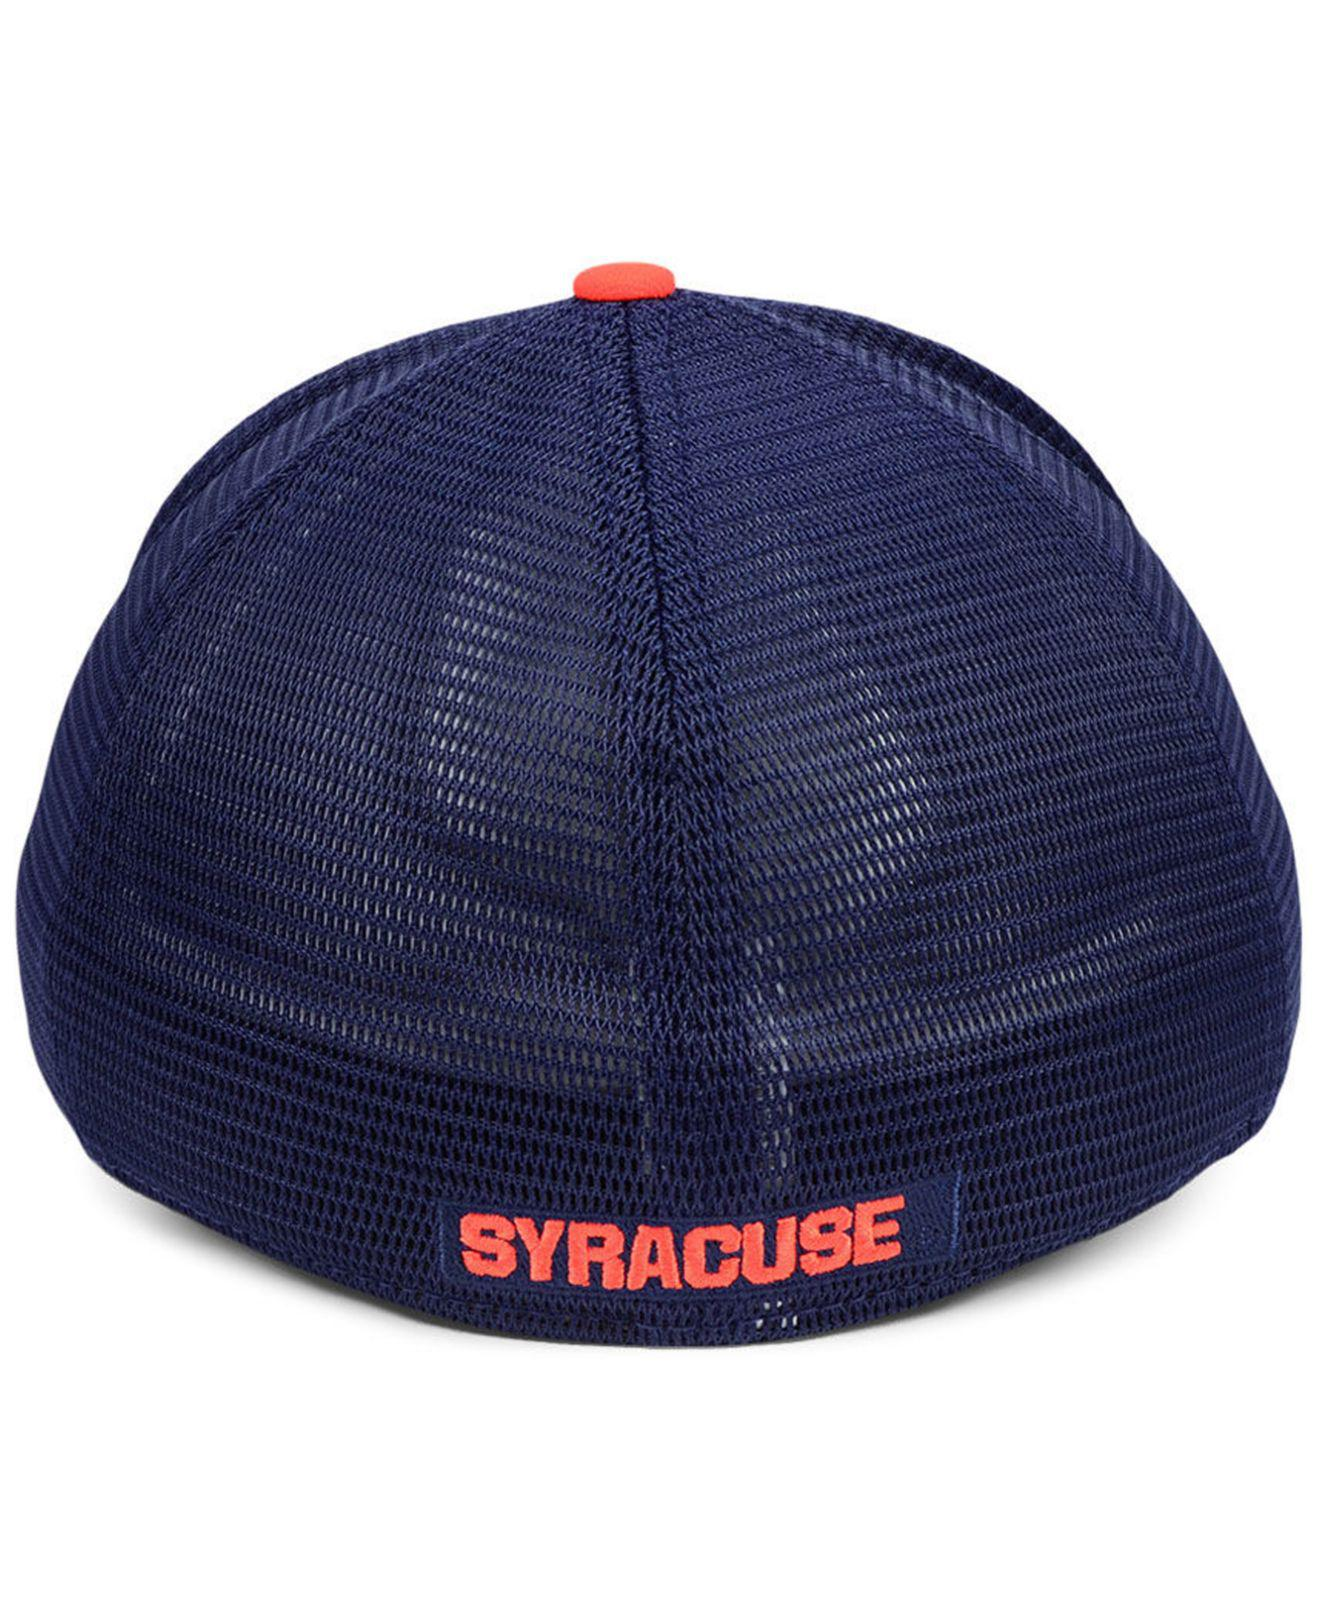 best loved b348f a2390 ... hot nike blue syracuse orange col aro swooshflex cap for men lyst. view  fullscreen 933f8